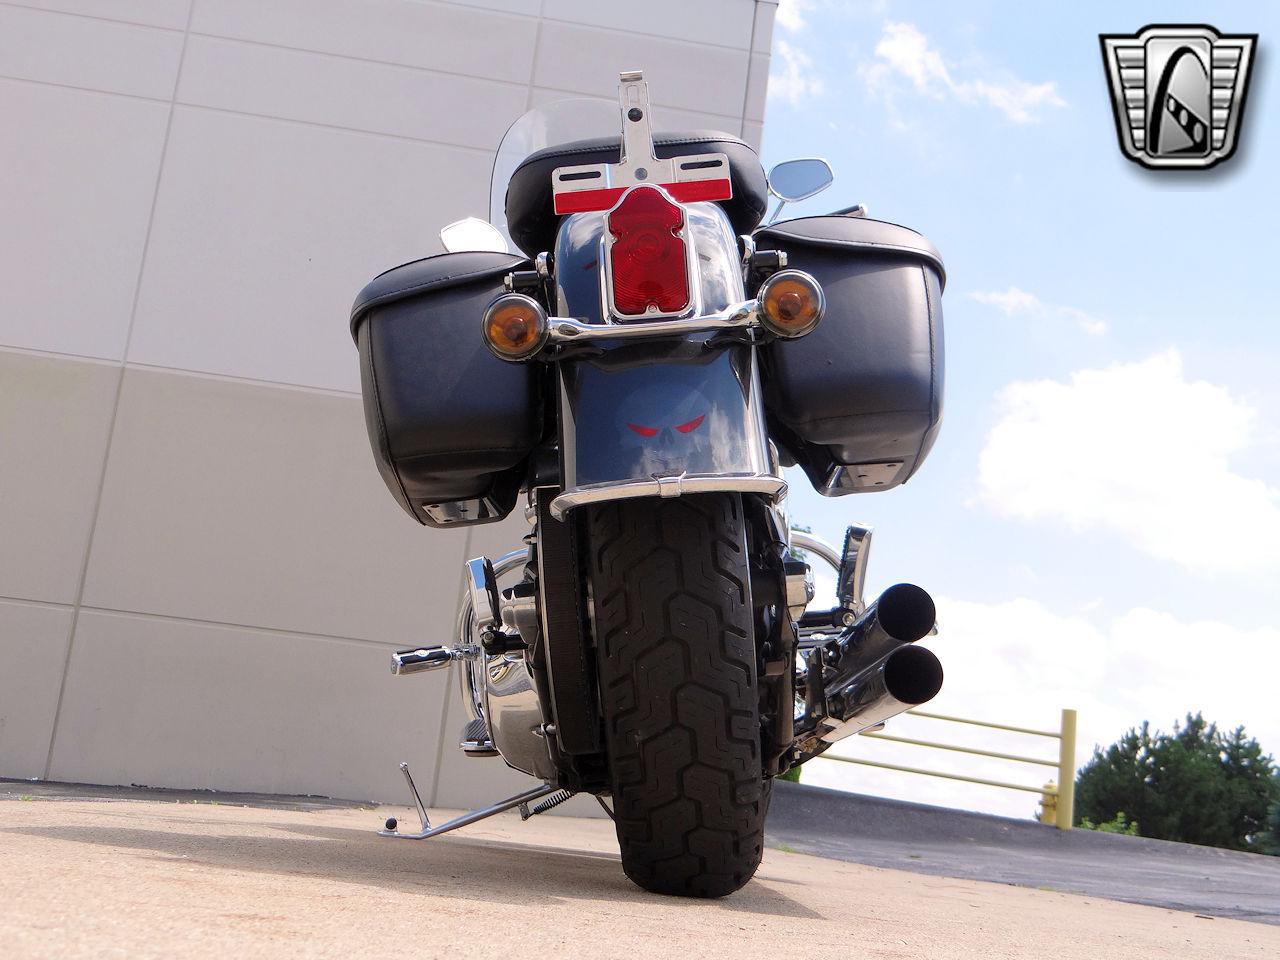 2006 Harley Davidson FLSTNI 31